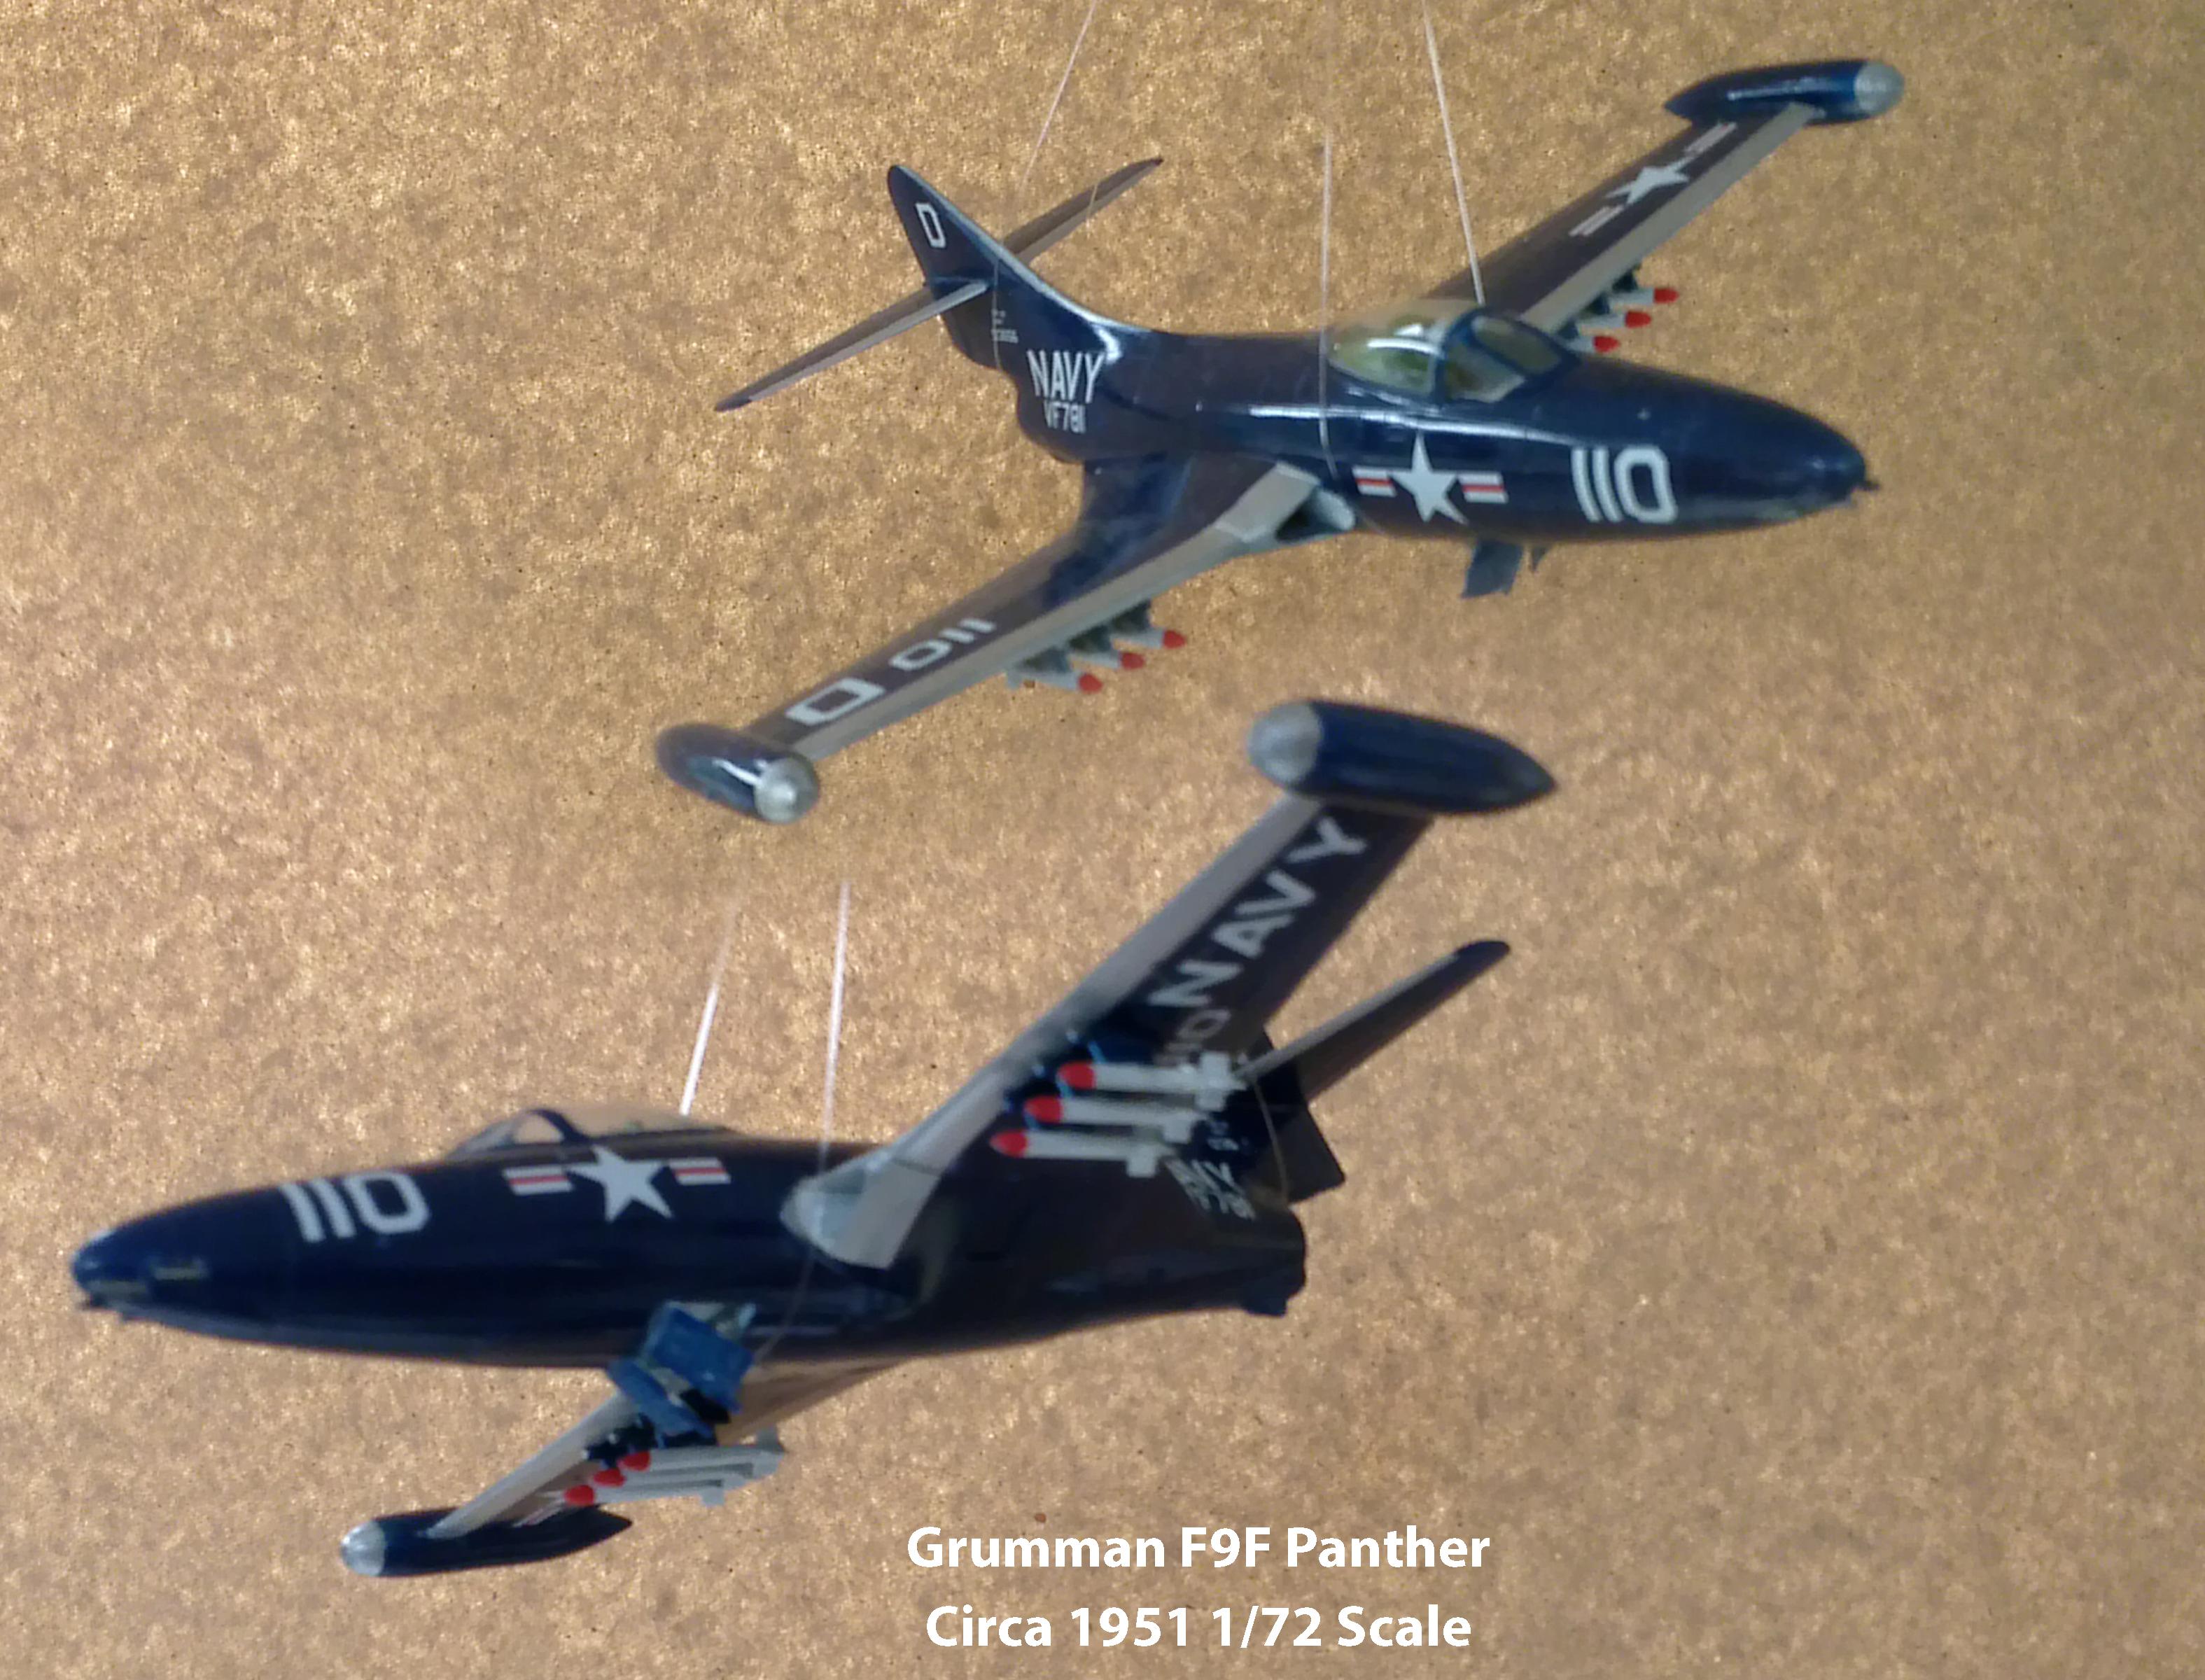 Grumman F9F-Panther